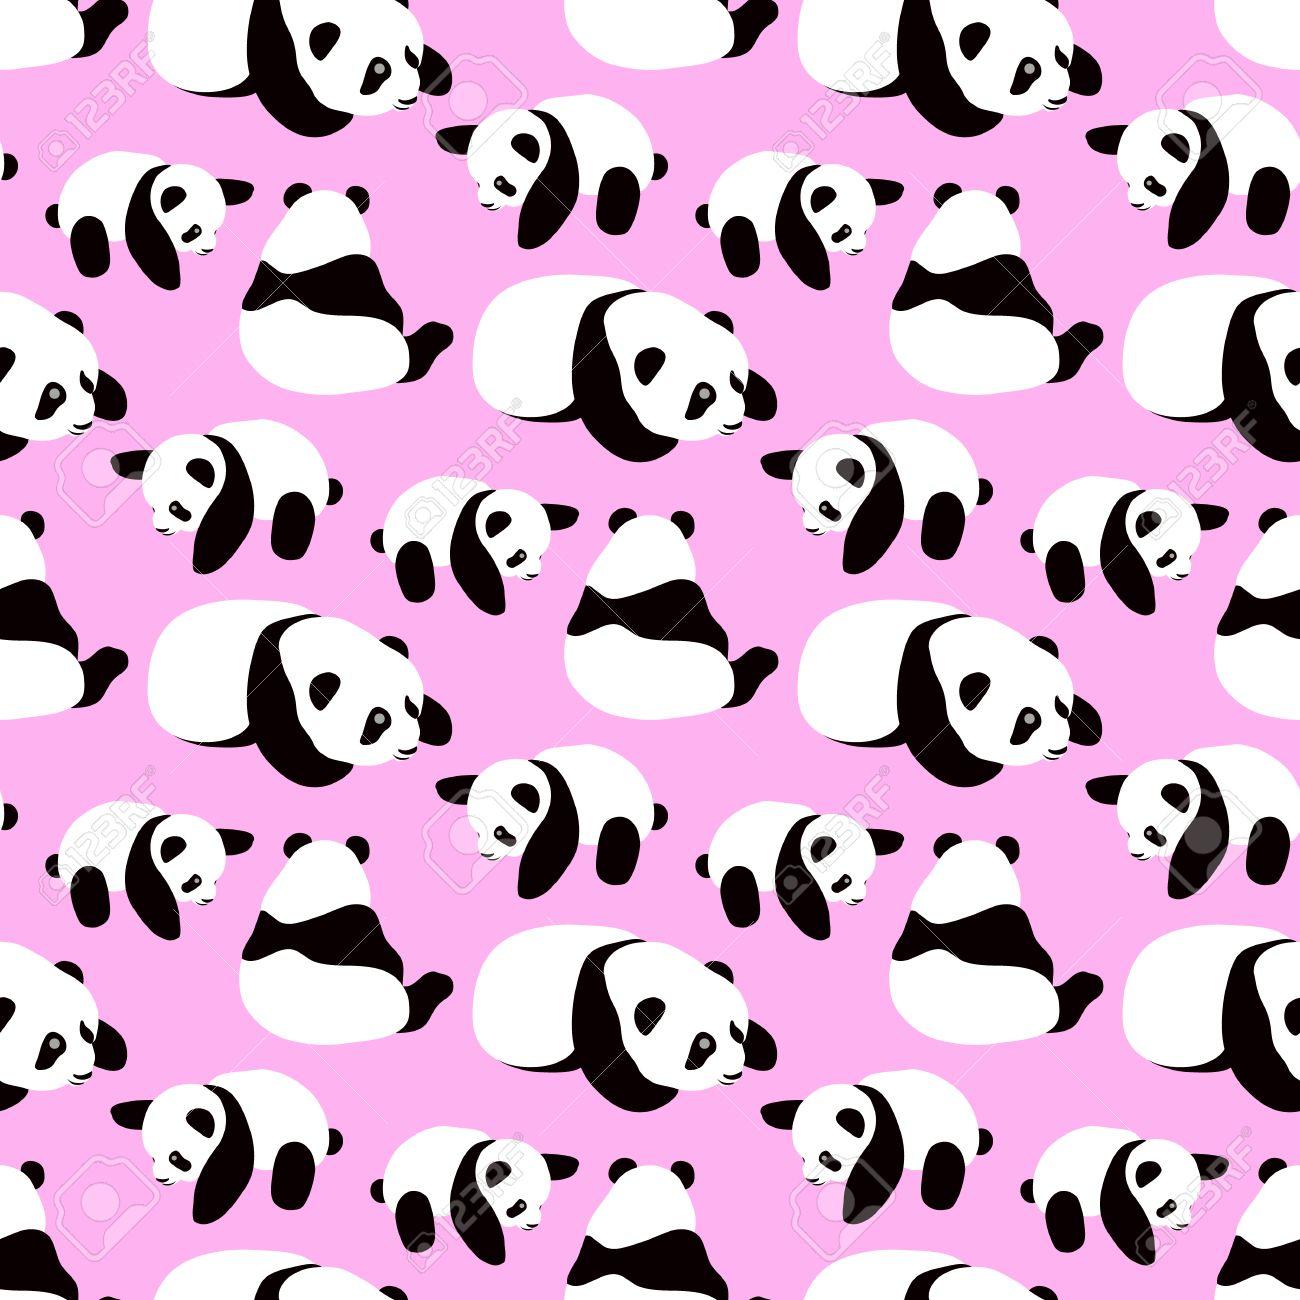 Imagenes De Osos Panda Animados Tiernos Imagui Imagenes De Pandas